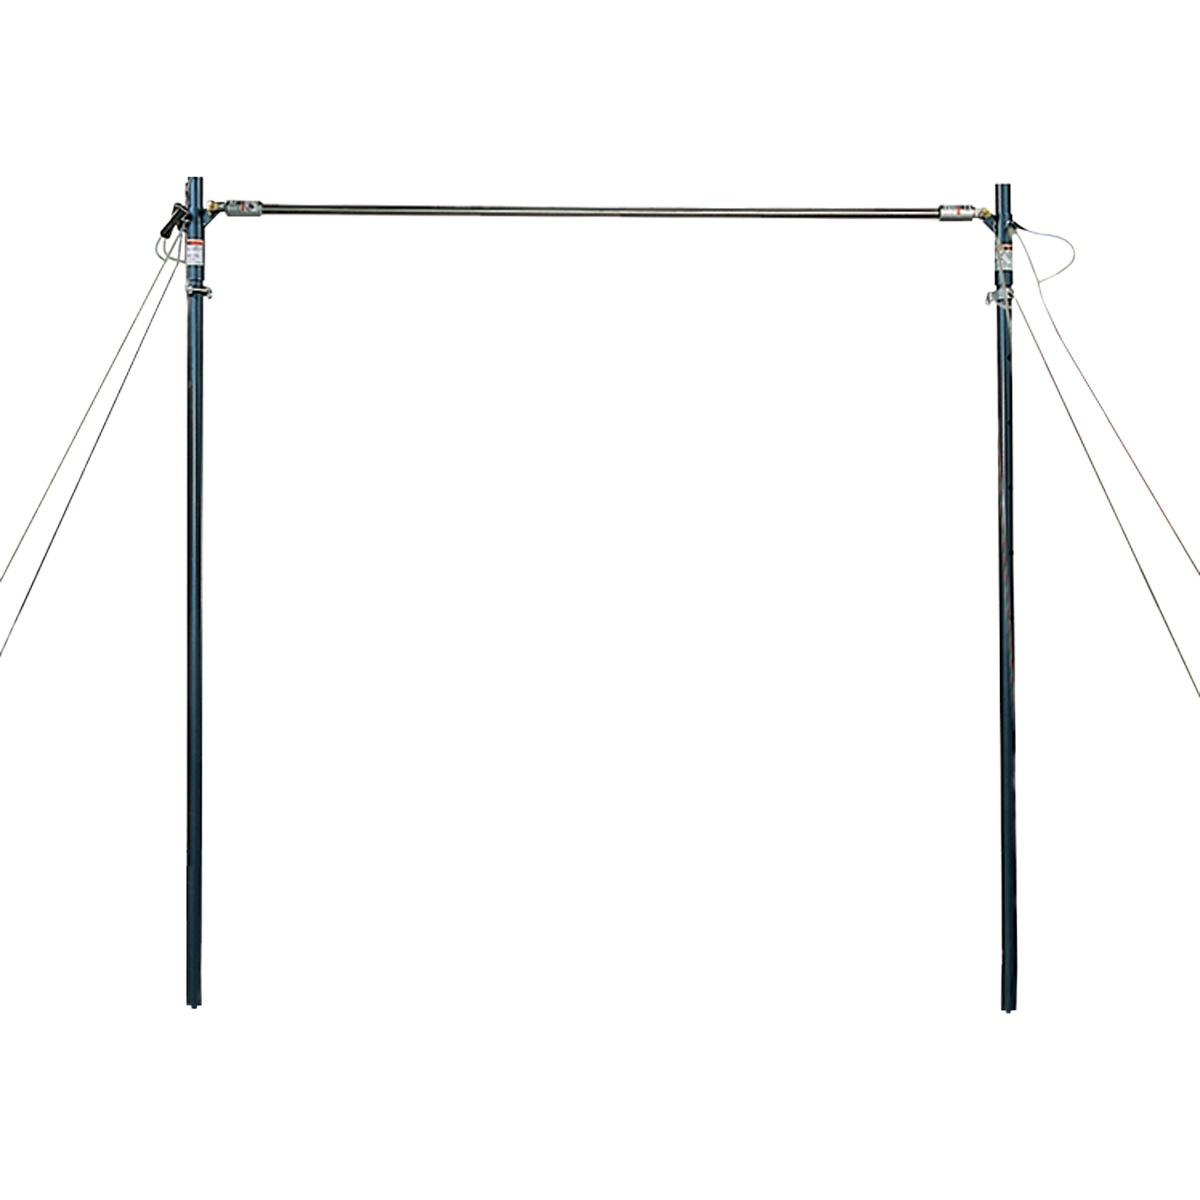 AAI Men's Adjustable Single Bar Trainer